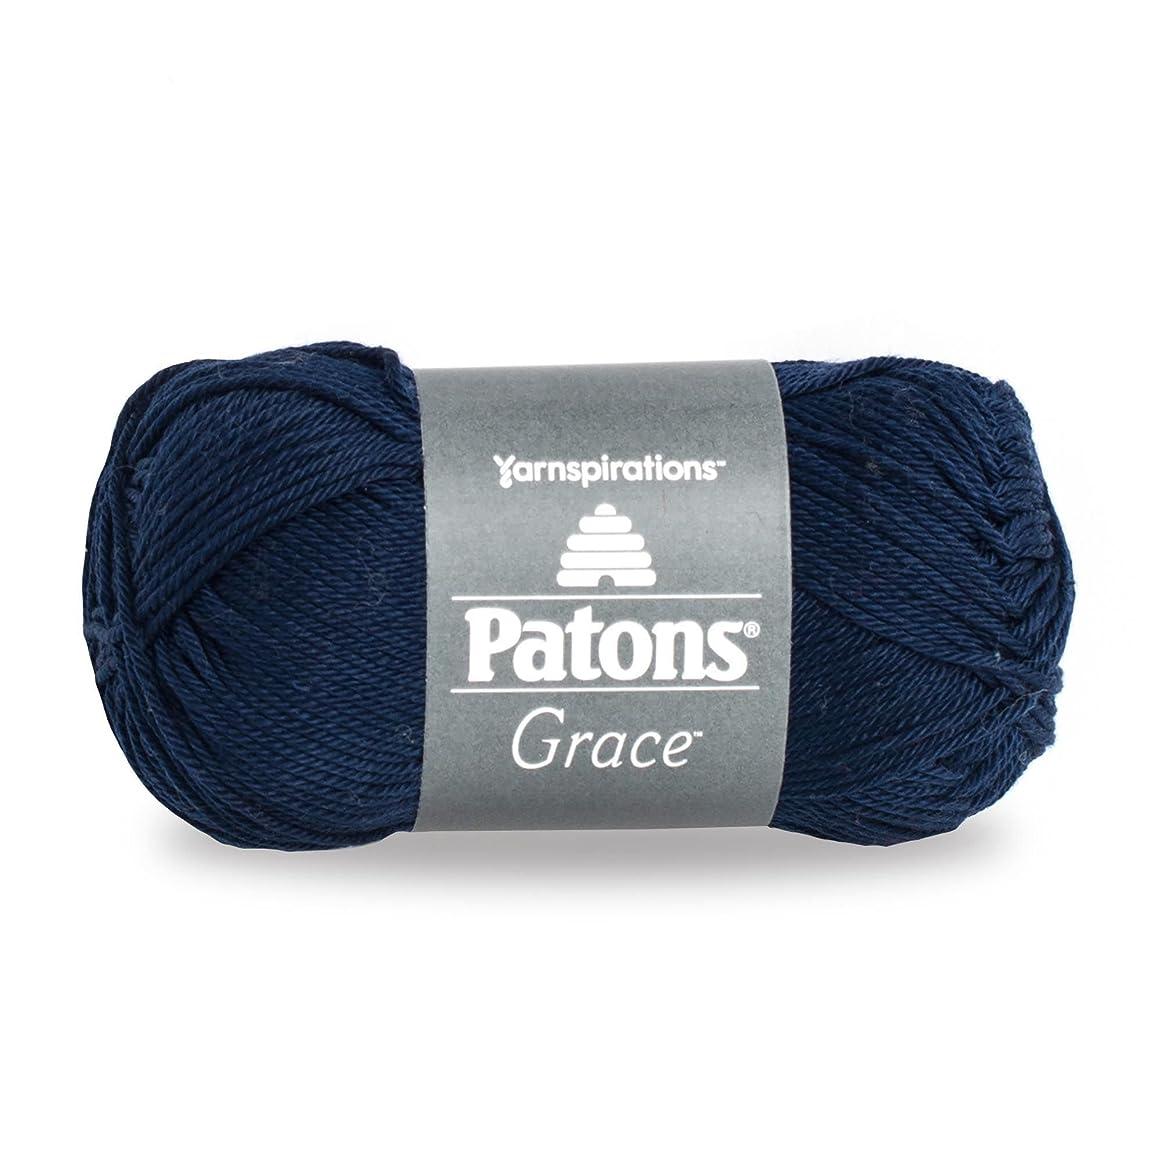 Patons Grace  Yarn, 1.75 oz, Navy, 1 Ball